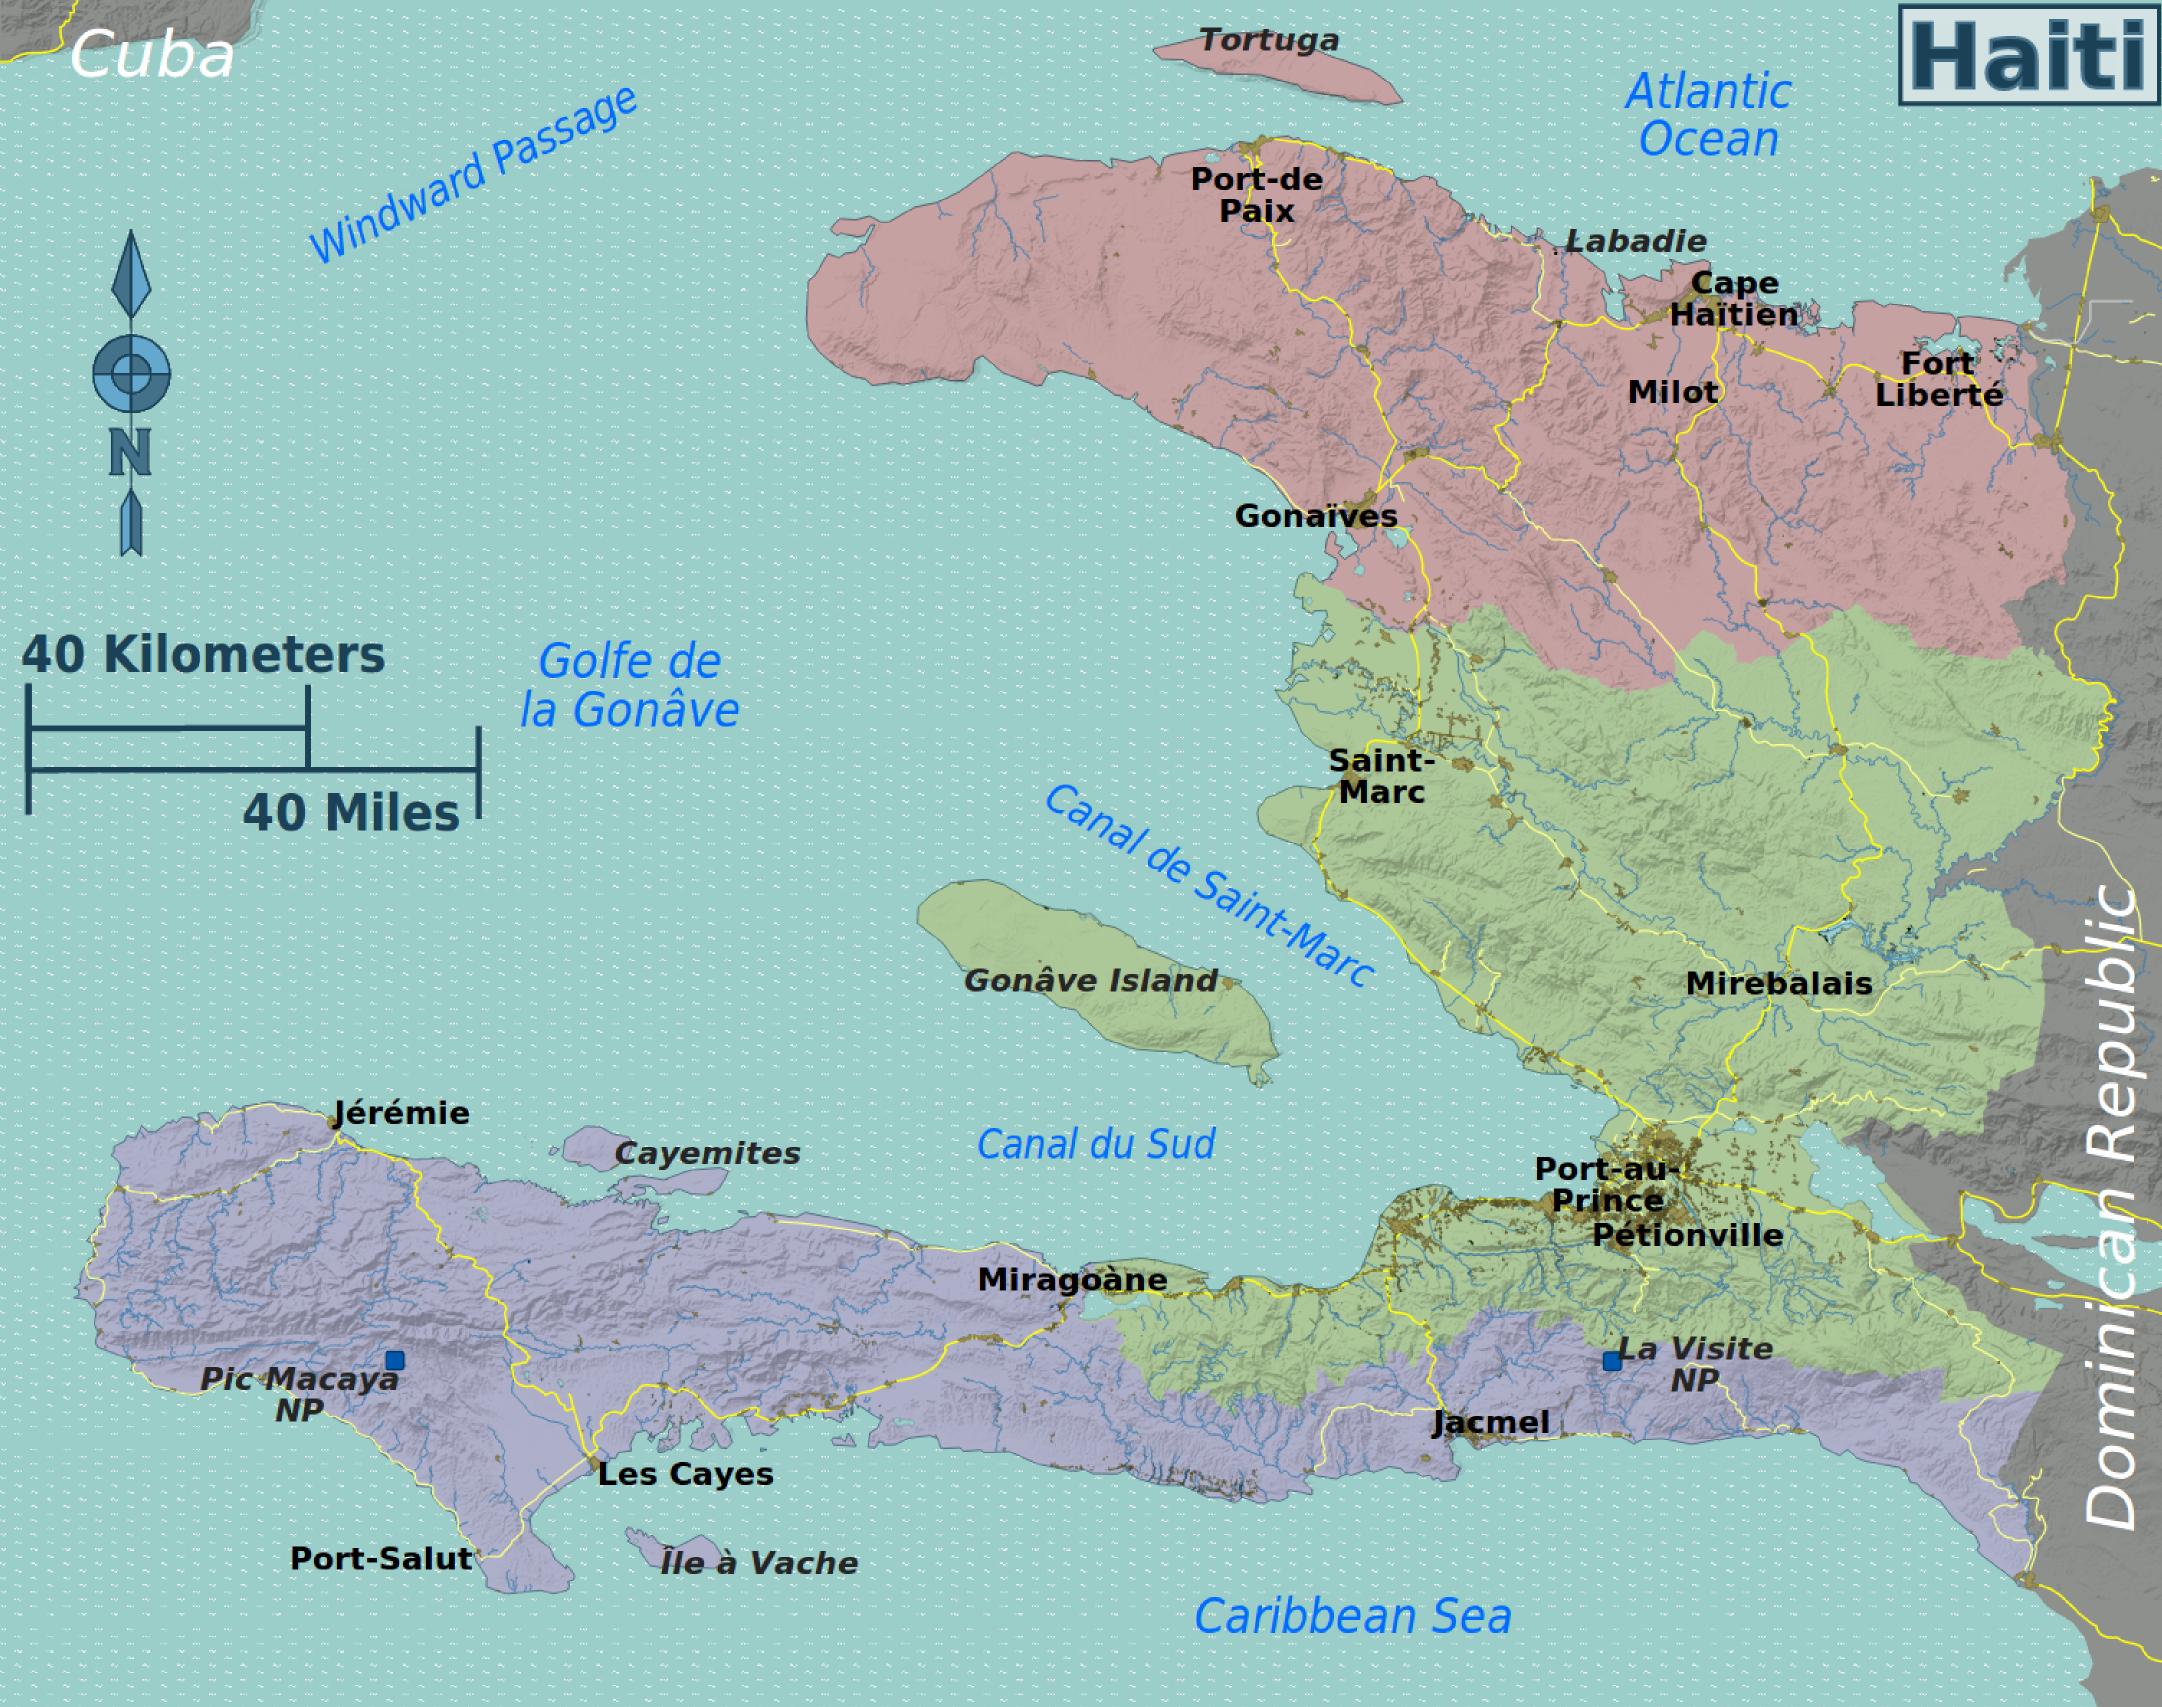 FileHaiti Regions Mappng Wikimedia Commons - Haiti regions map